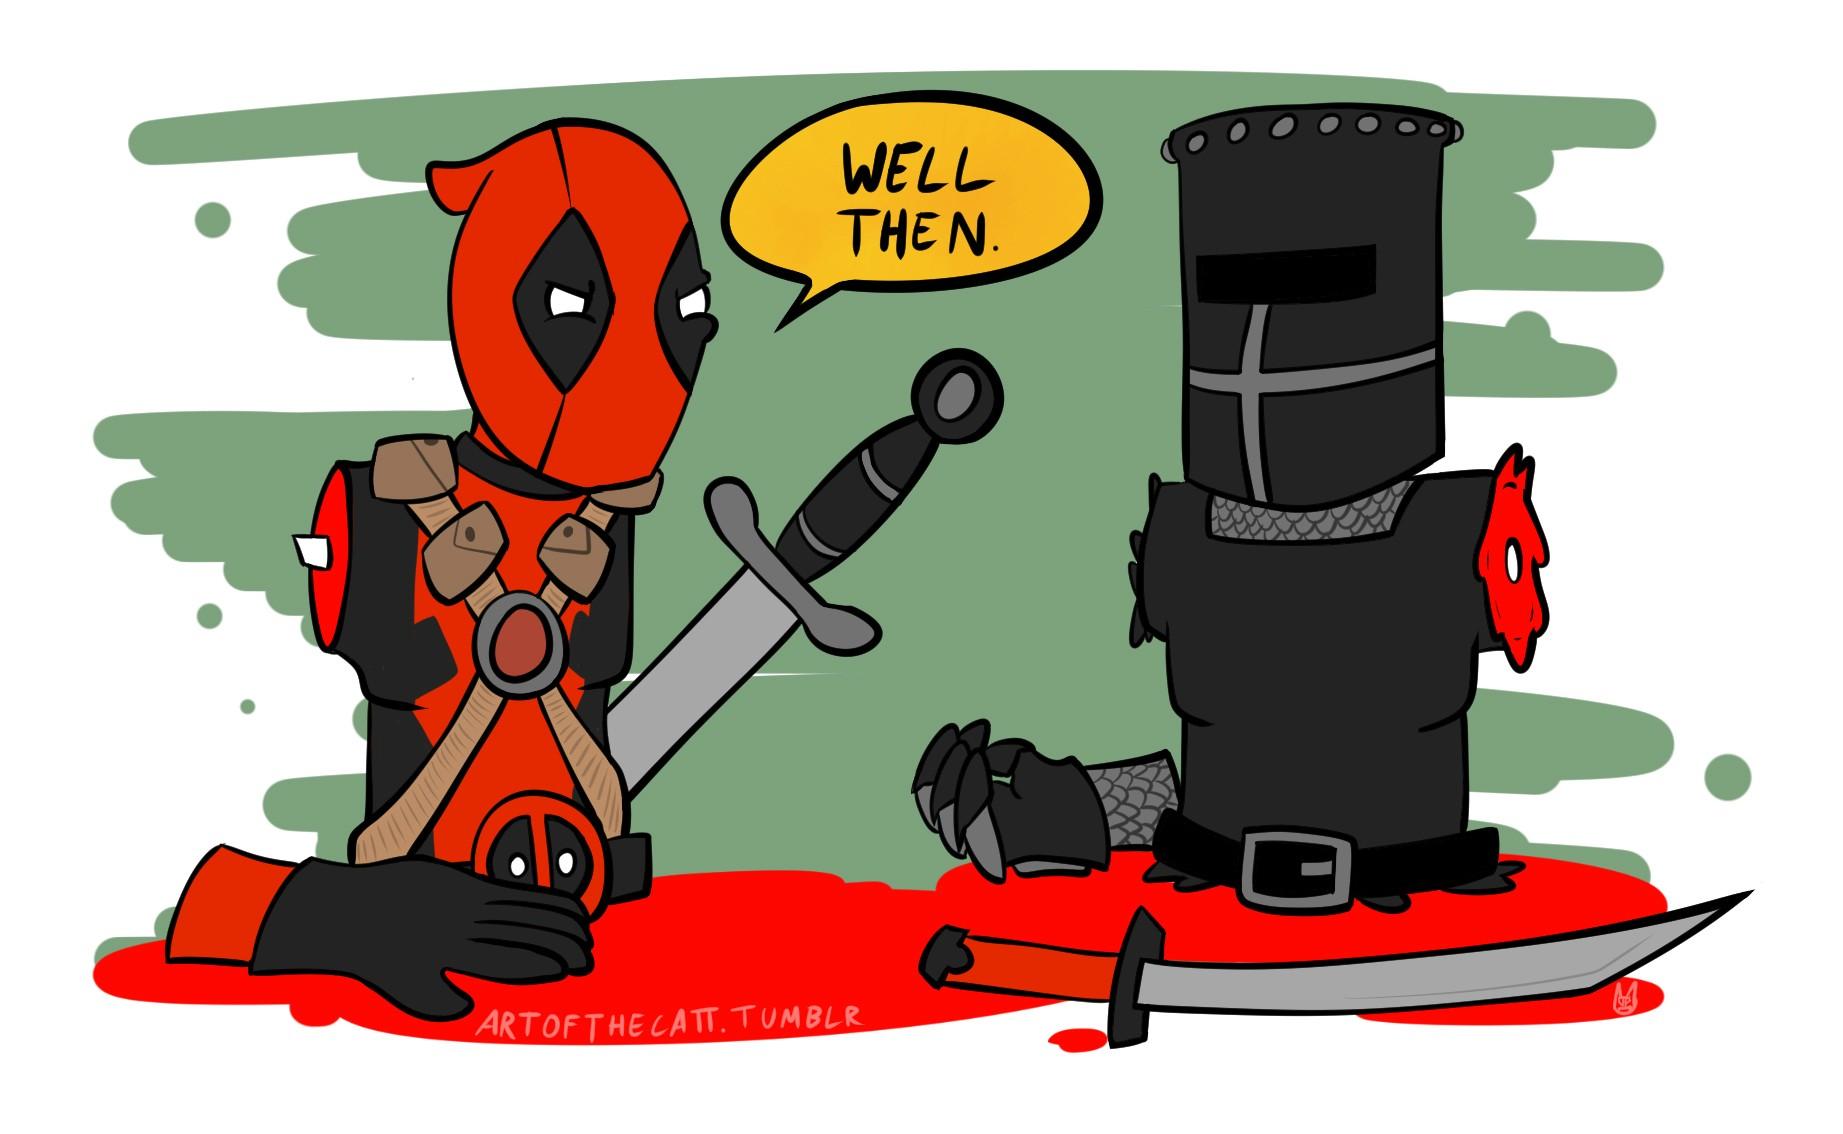 Suicide clipart deadpool : Knight Knight Deadpool Deadpool